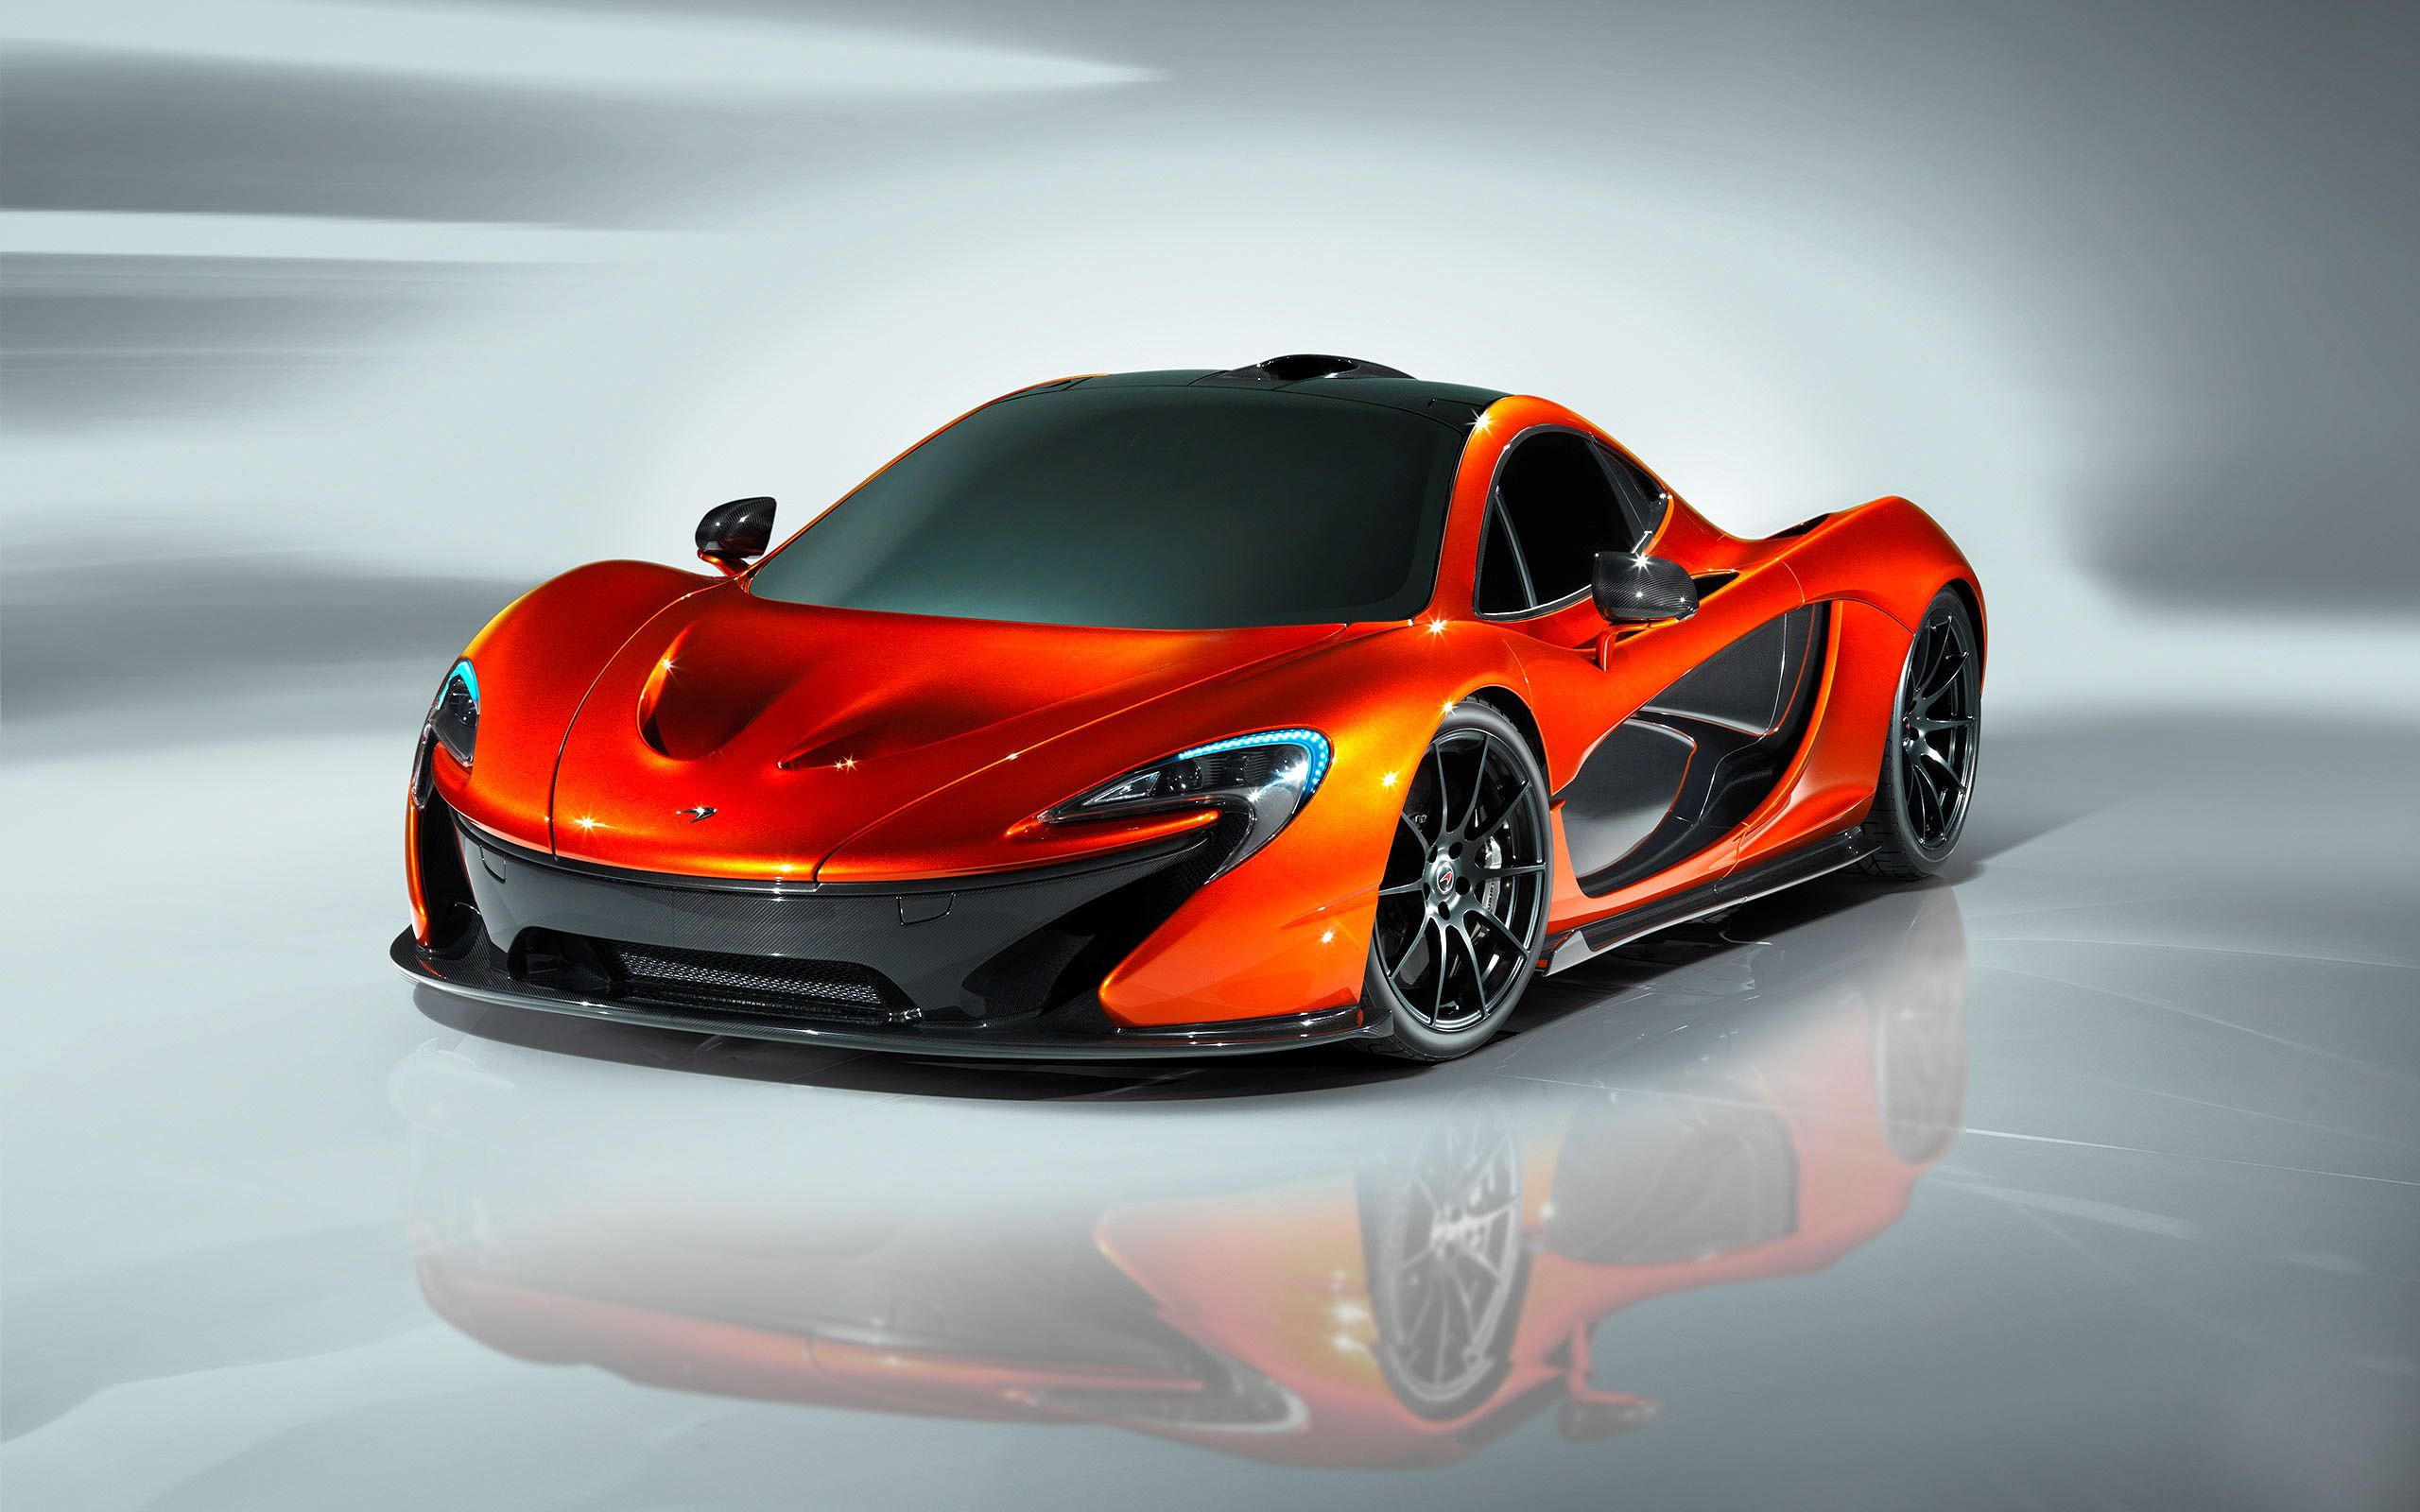 Mclaren P1 Concept Car Orange HD wallpapers Autos